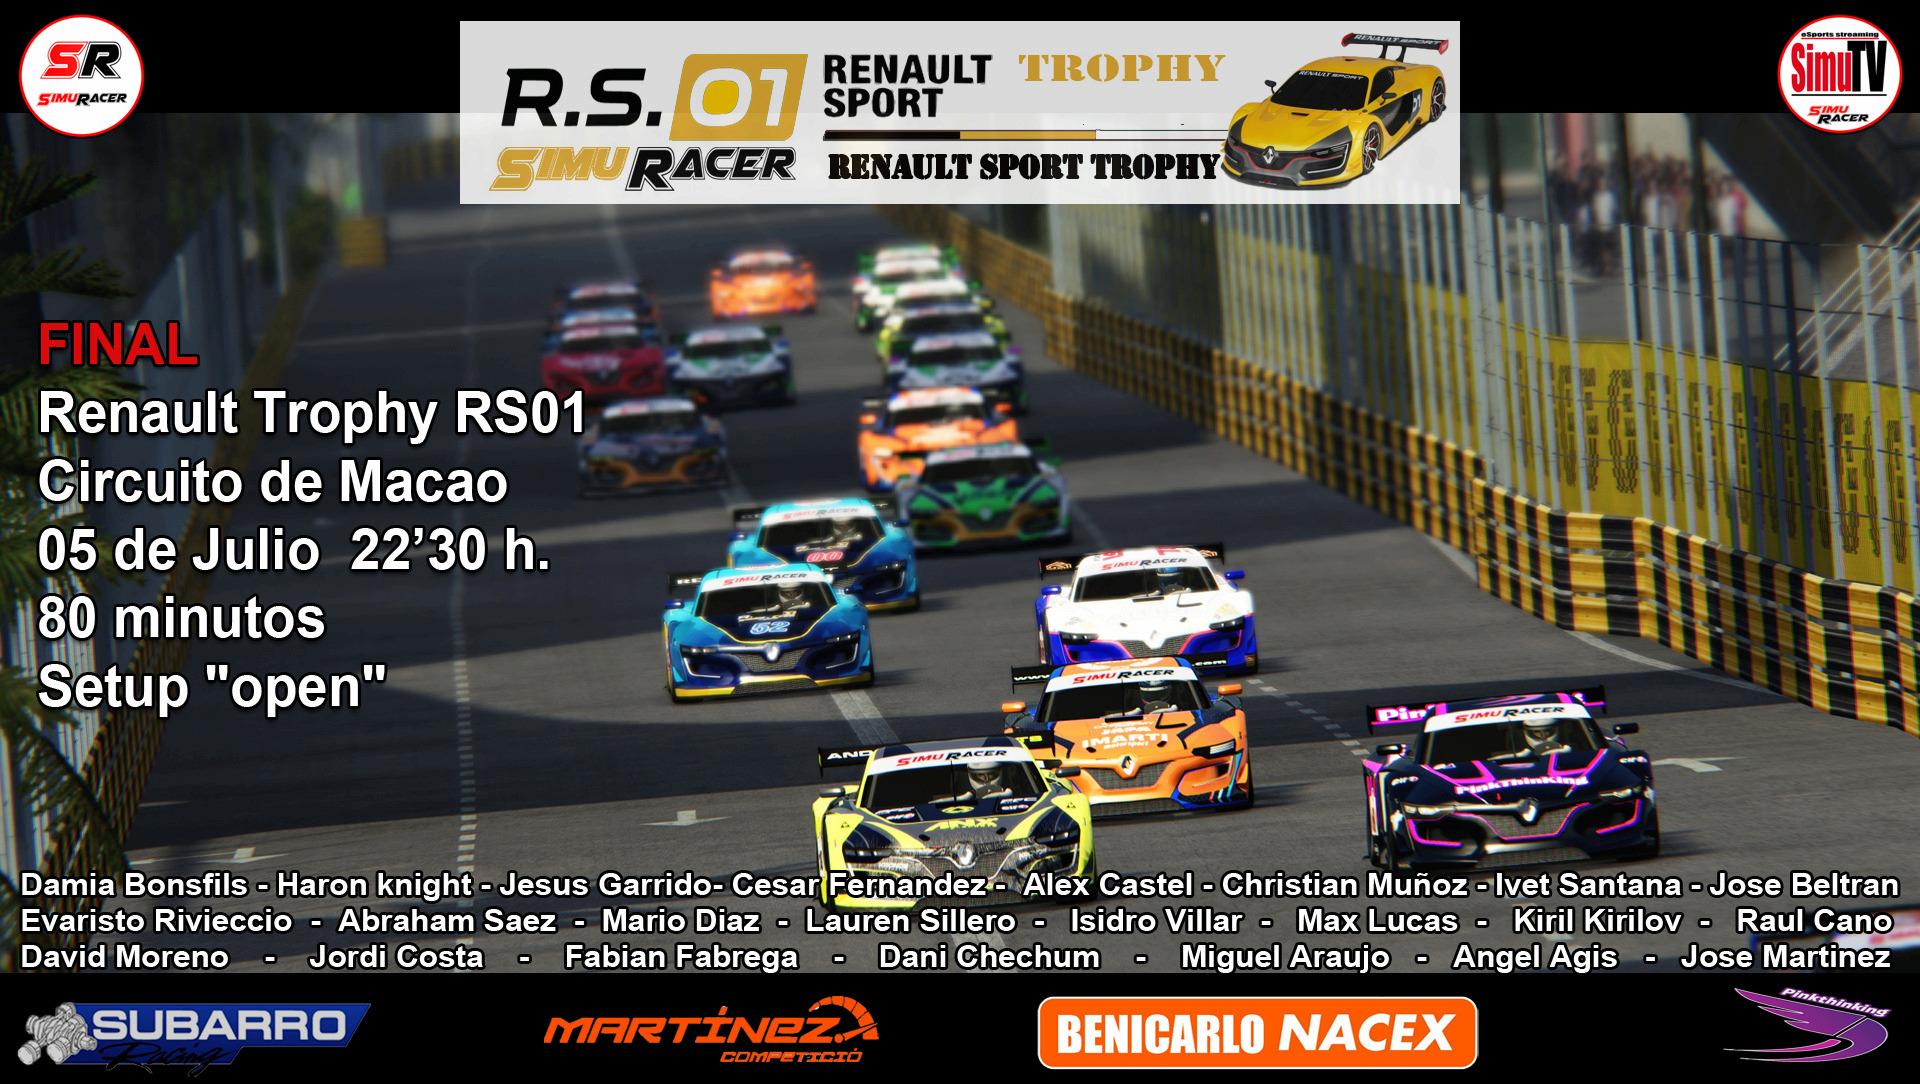 FINAL - RENAULT TROPHY RS01 Final10